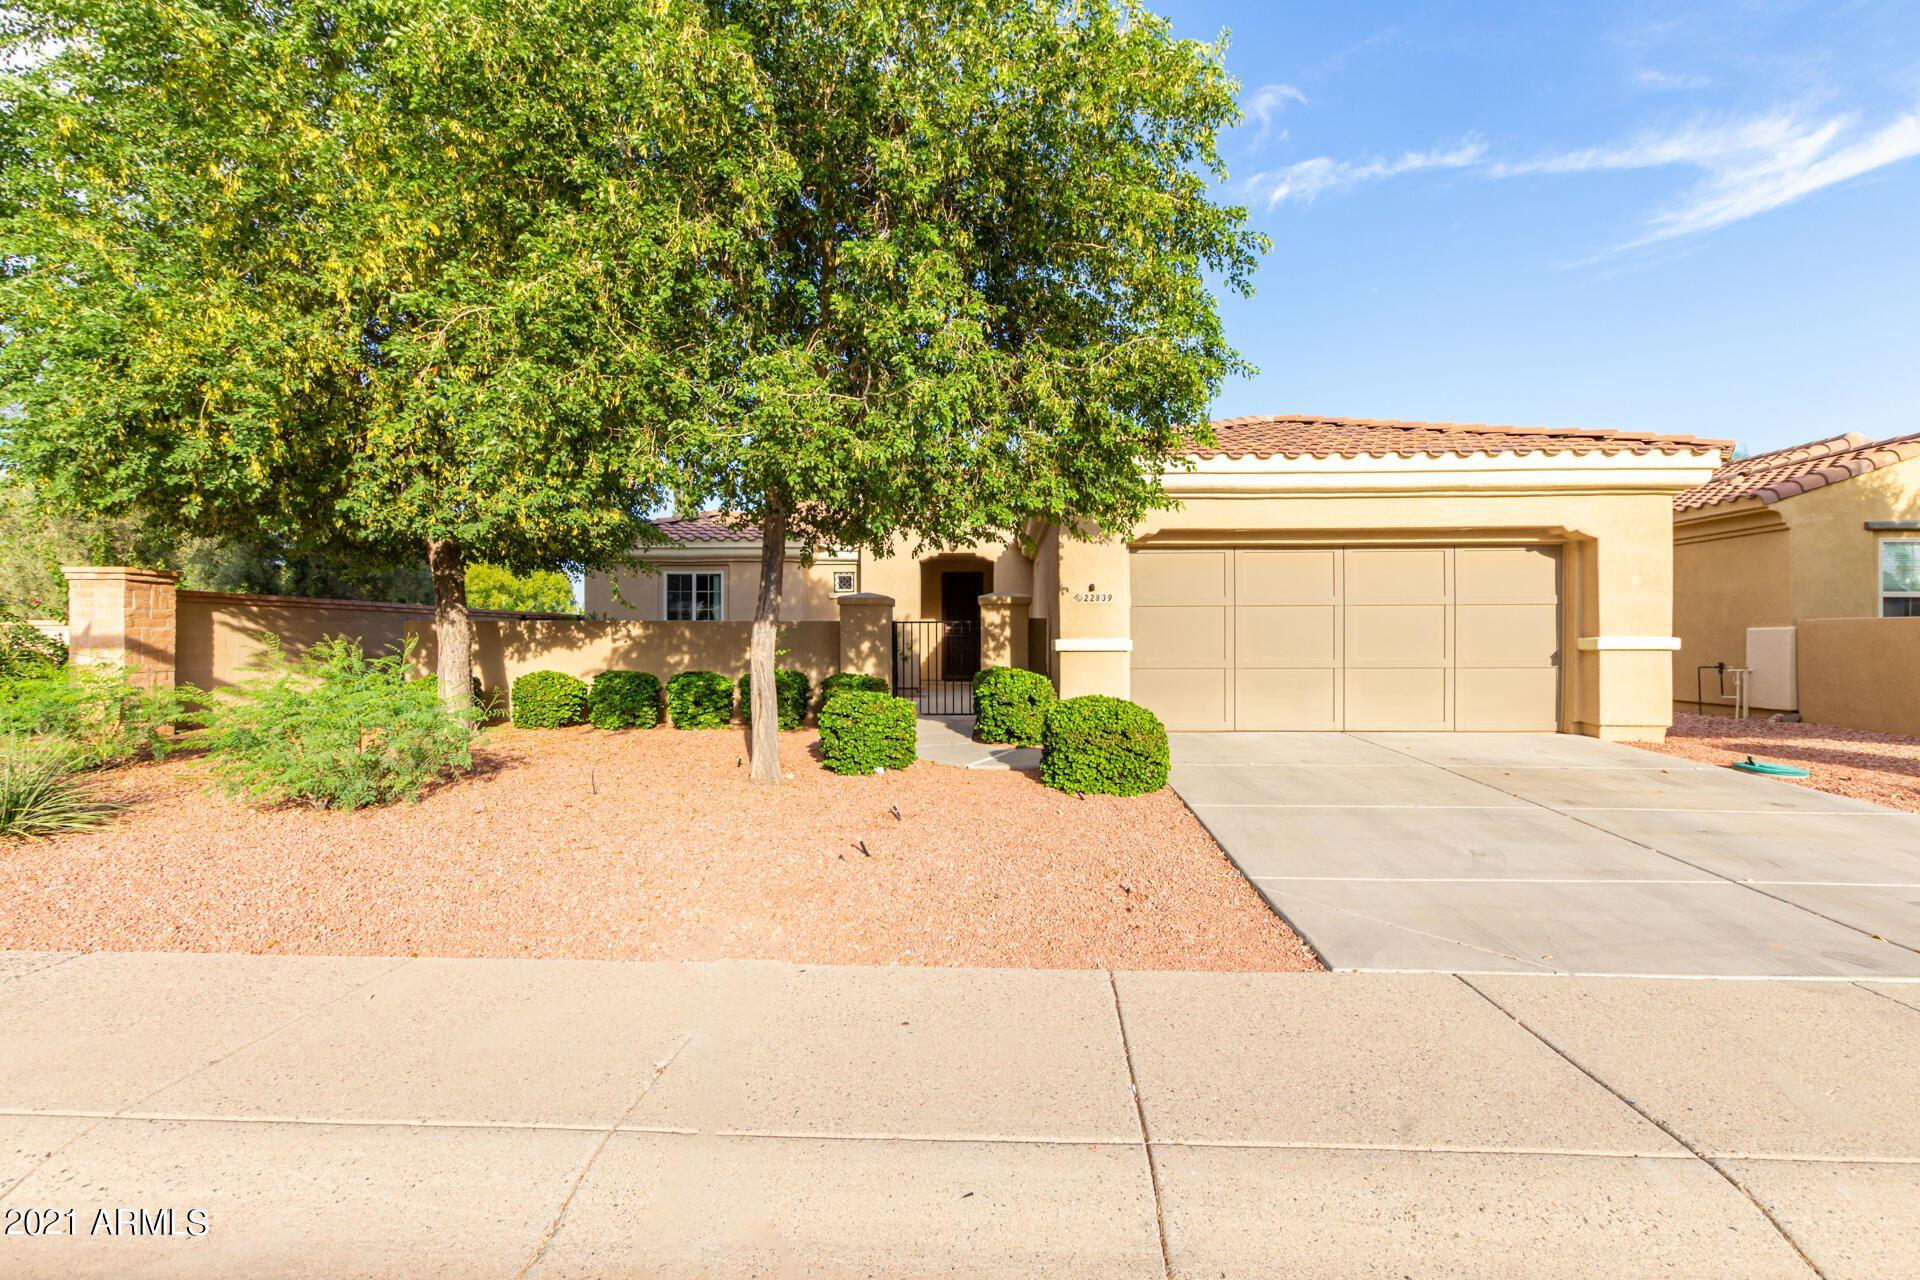 22839 N ARRELLAGA Drive, Sun City West, AZ 85375 - MLS#: 6298176